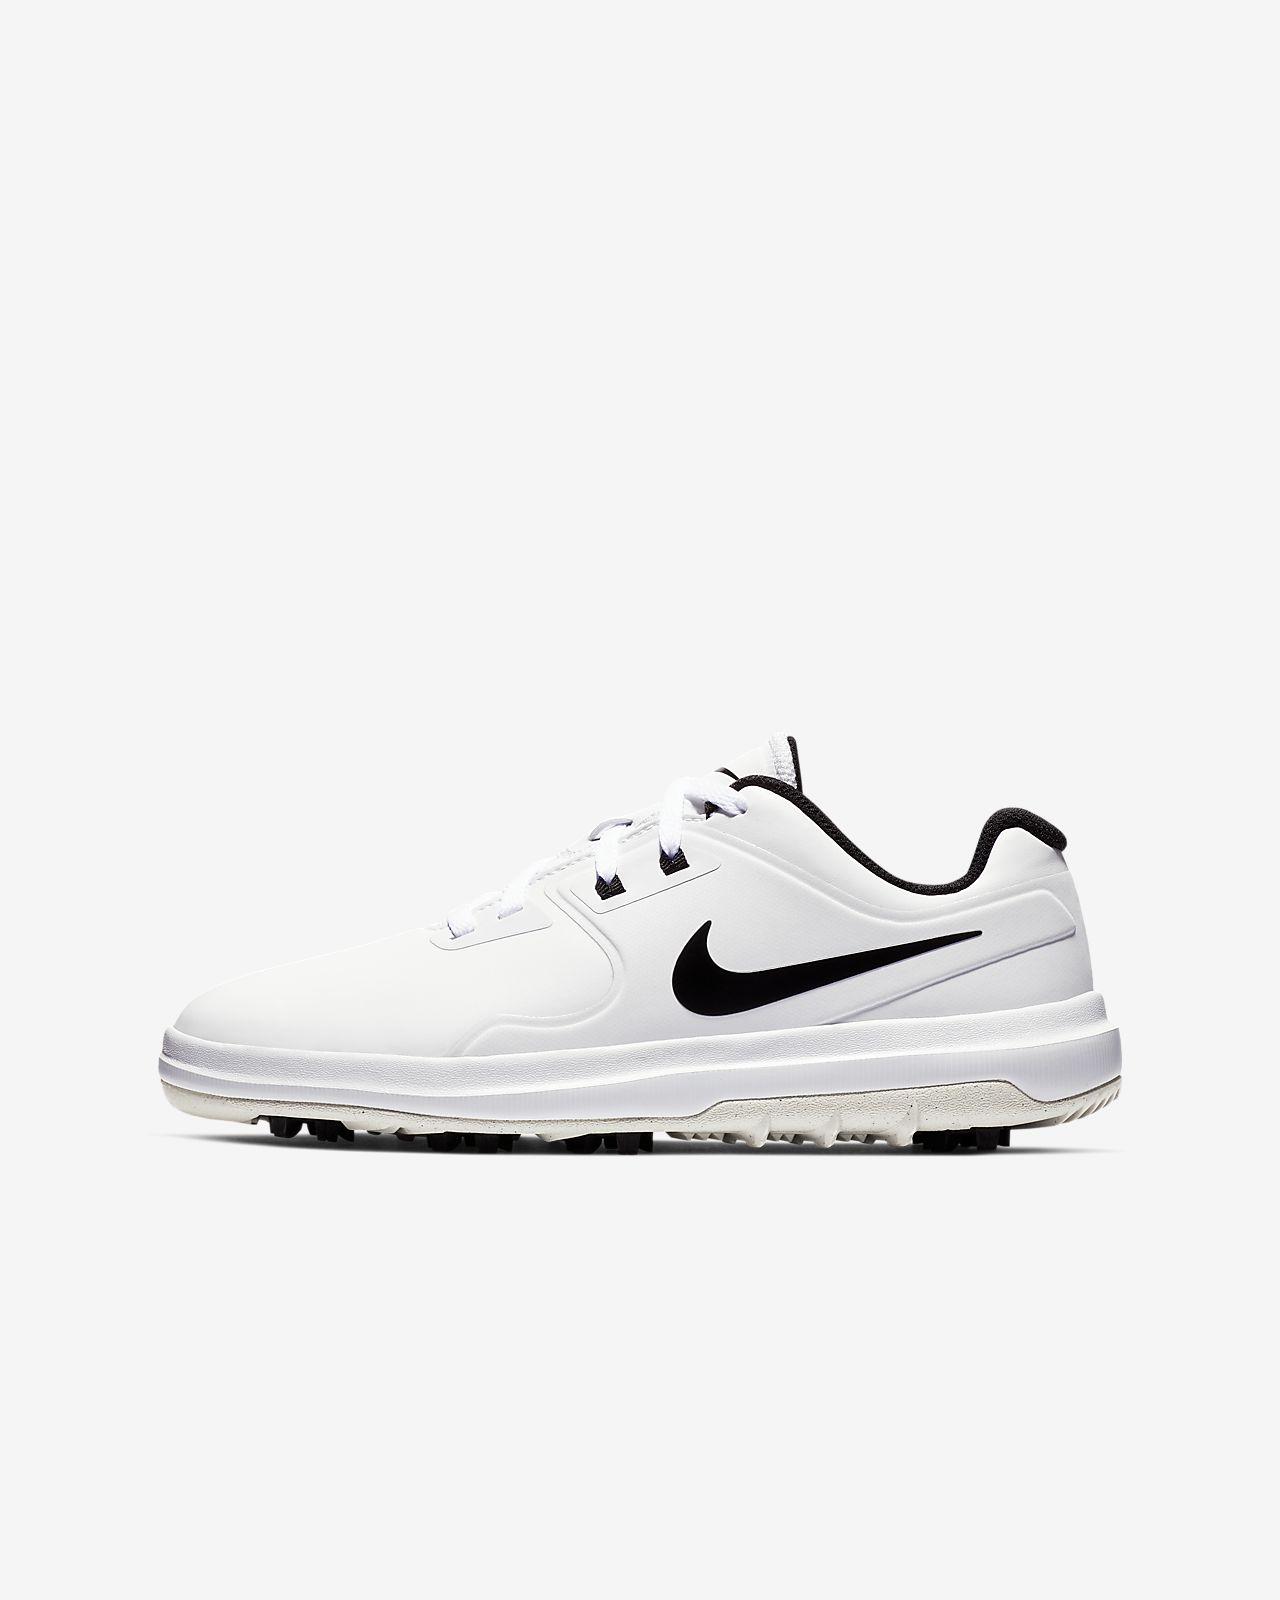 Scarpa da golf Nike Vapor Pro Jr. - Bambini/Ragazzi